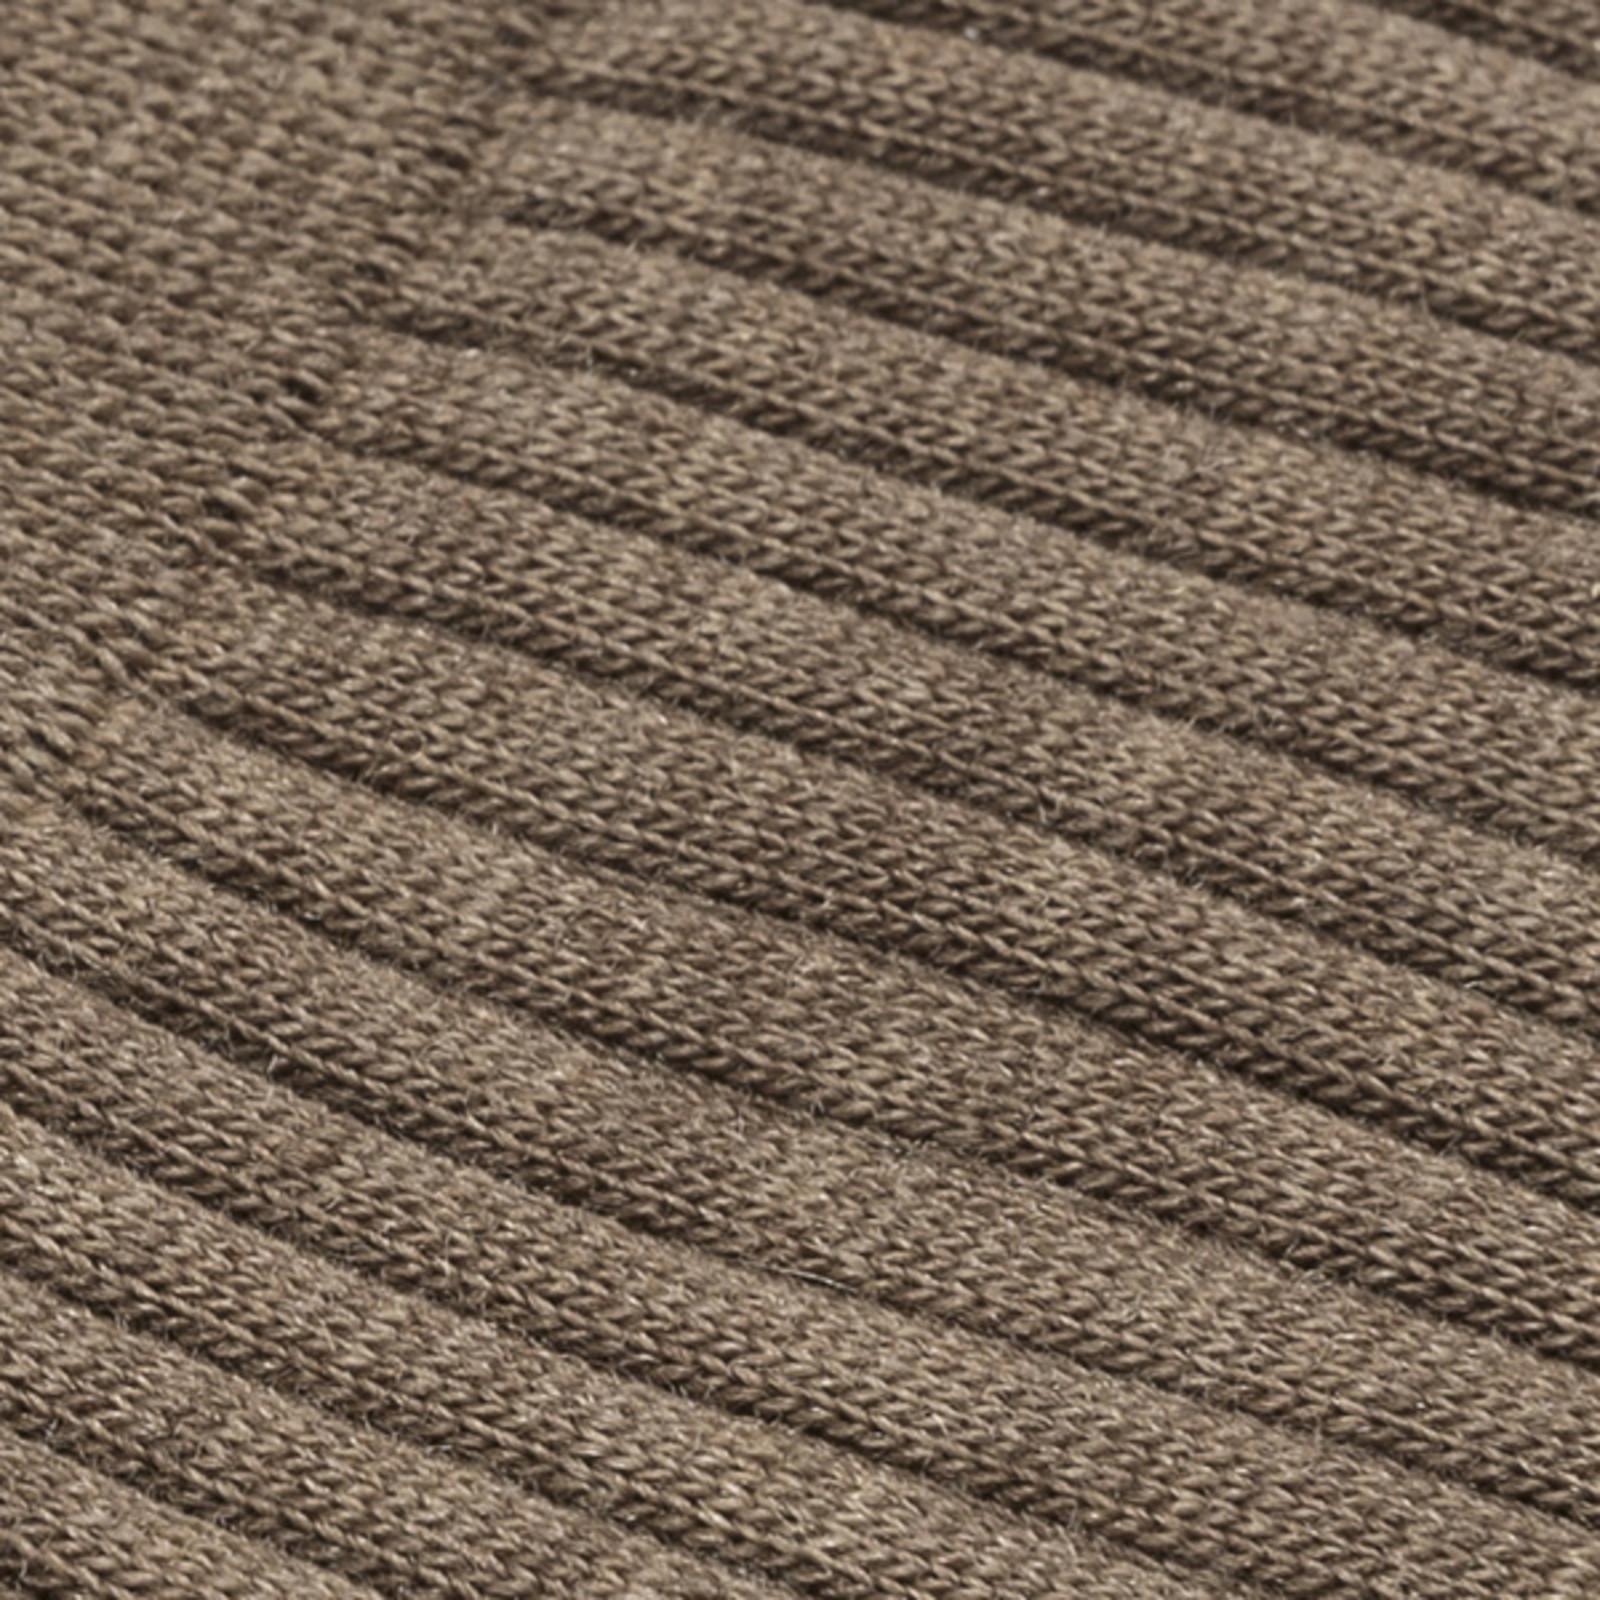 Carlo Lanza Camel wool socks